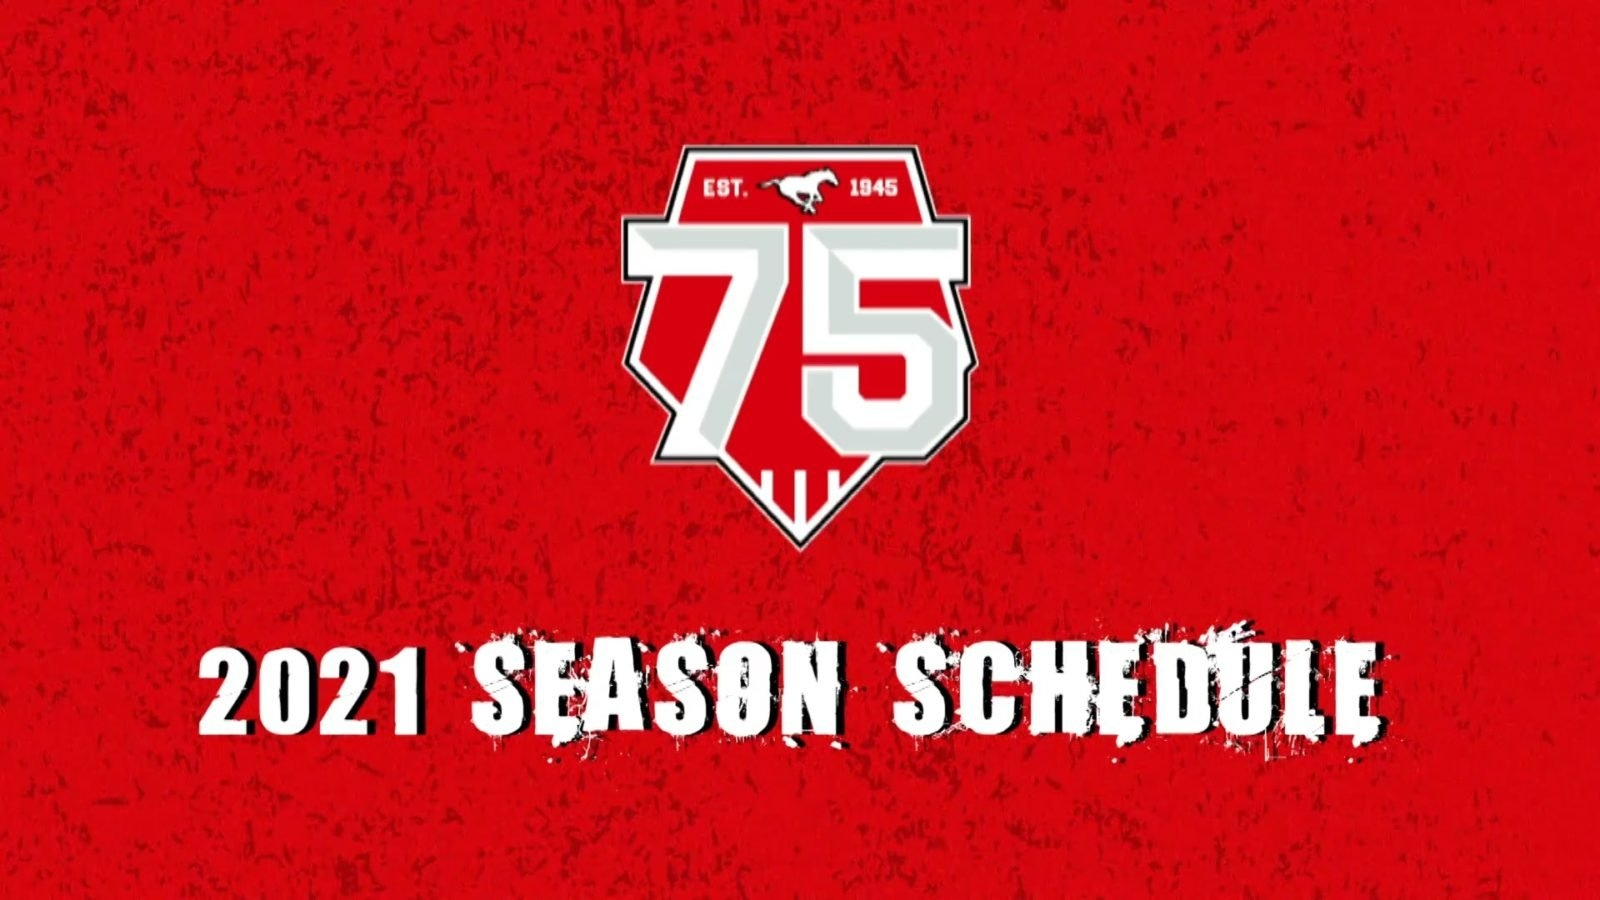 The 2021 Schedule - Calgary Stampeders throughout 2021 Media Broadcast Calendar